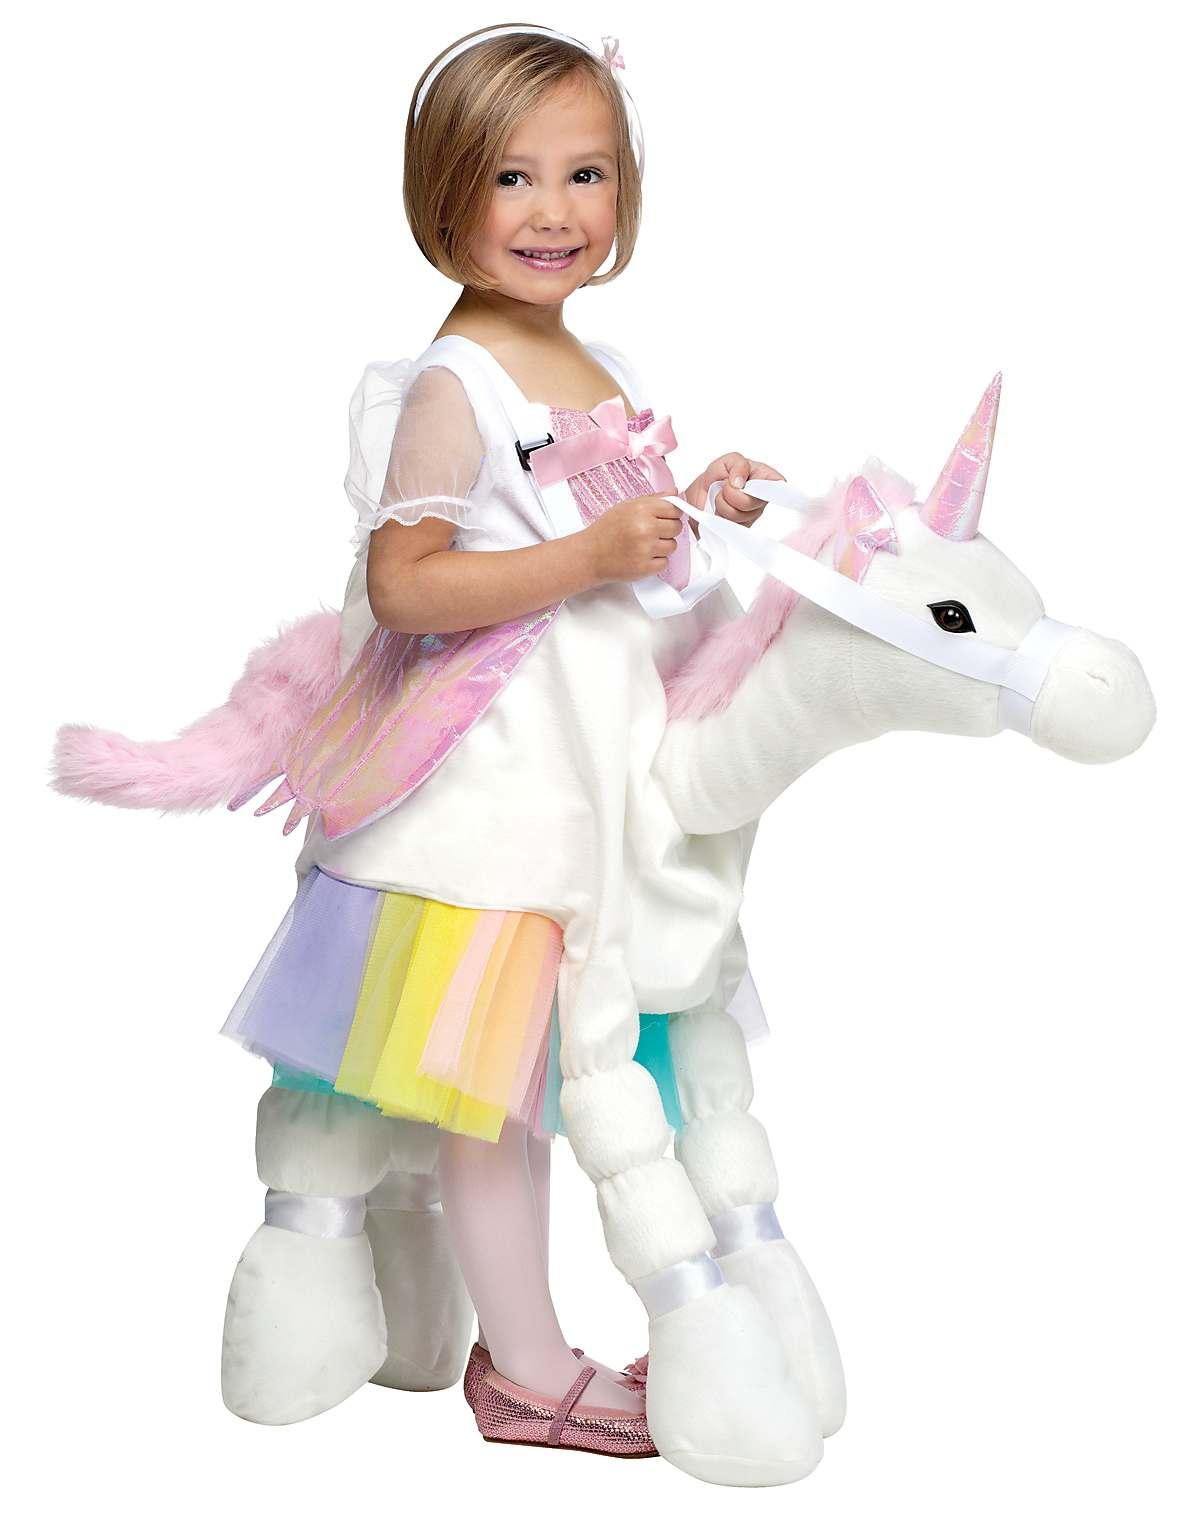 Kids Unicorn Costumes for Halloween